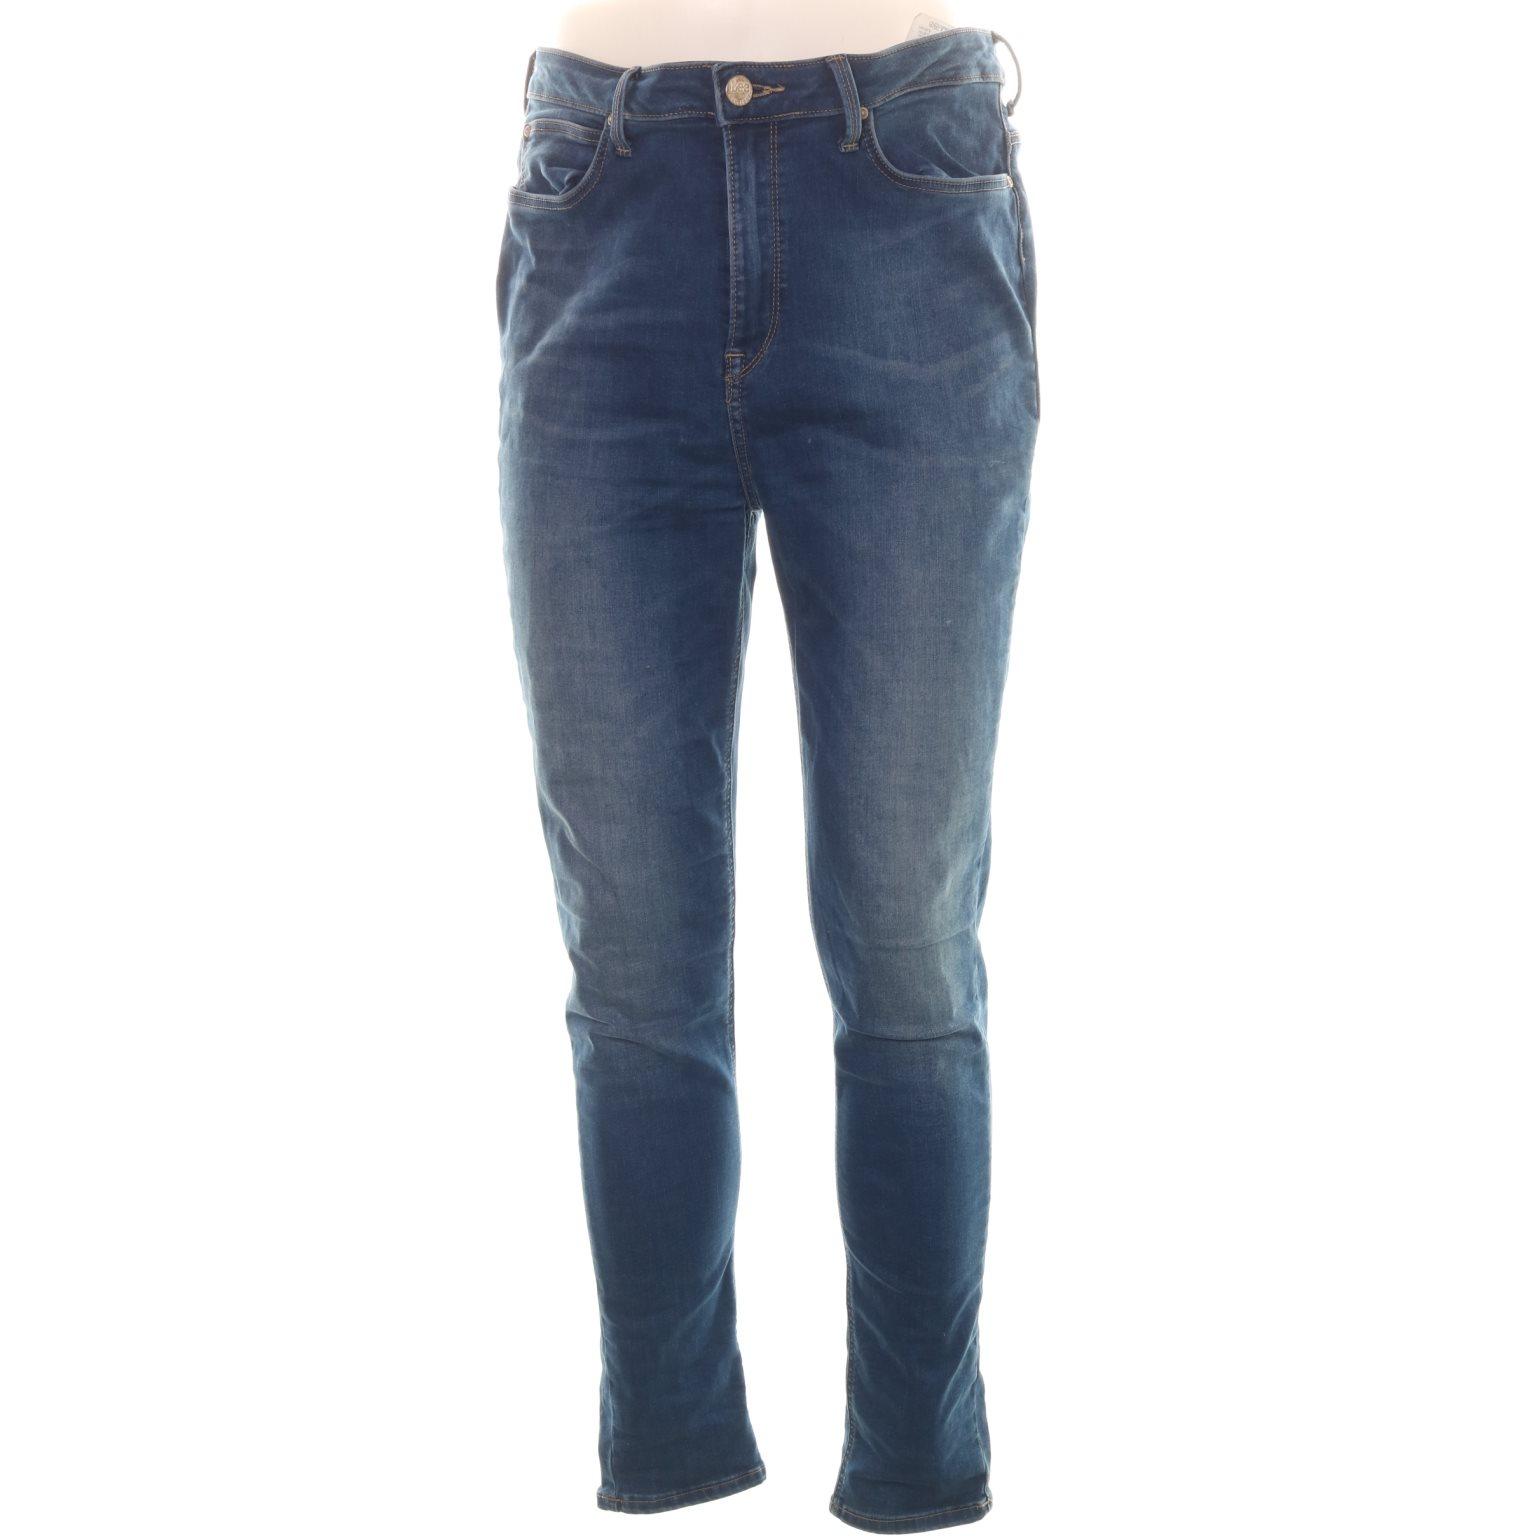 Lee, Jeans, Strl: 33/32, Skyler, Blå